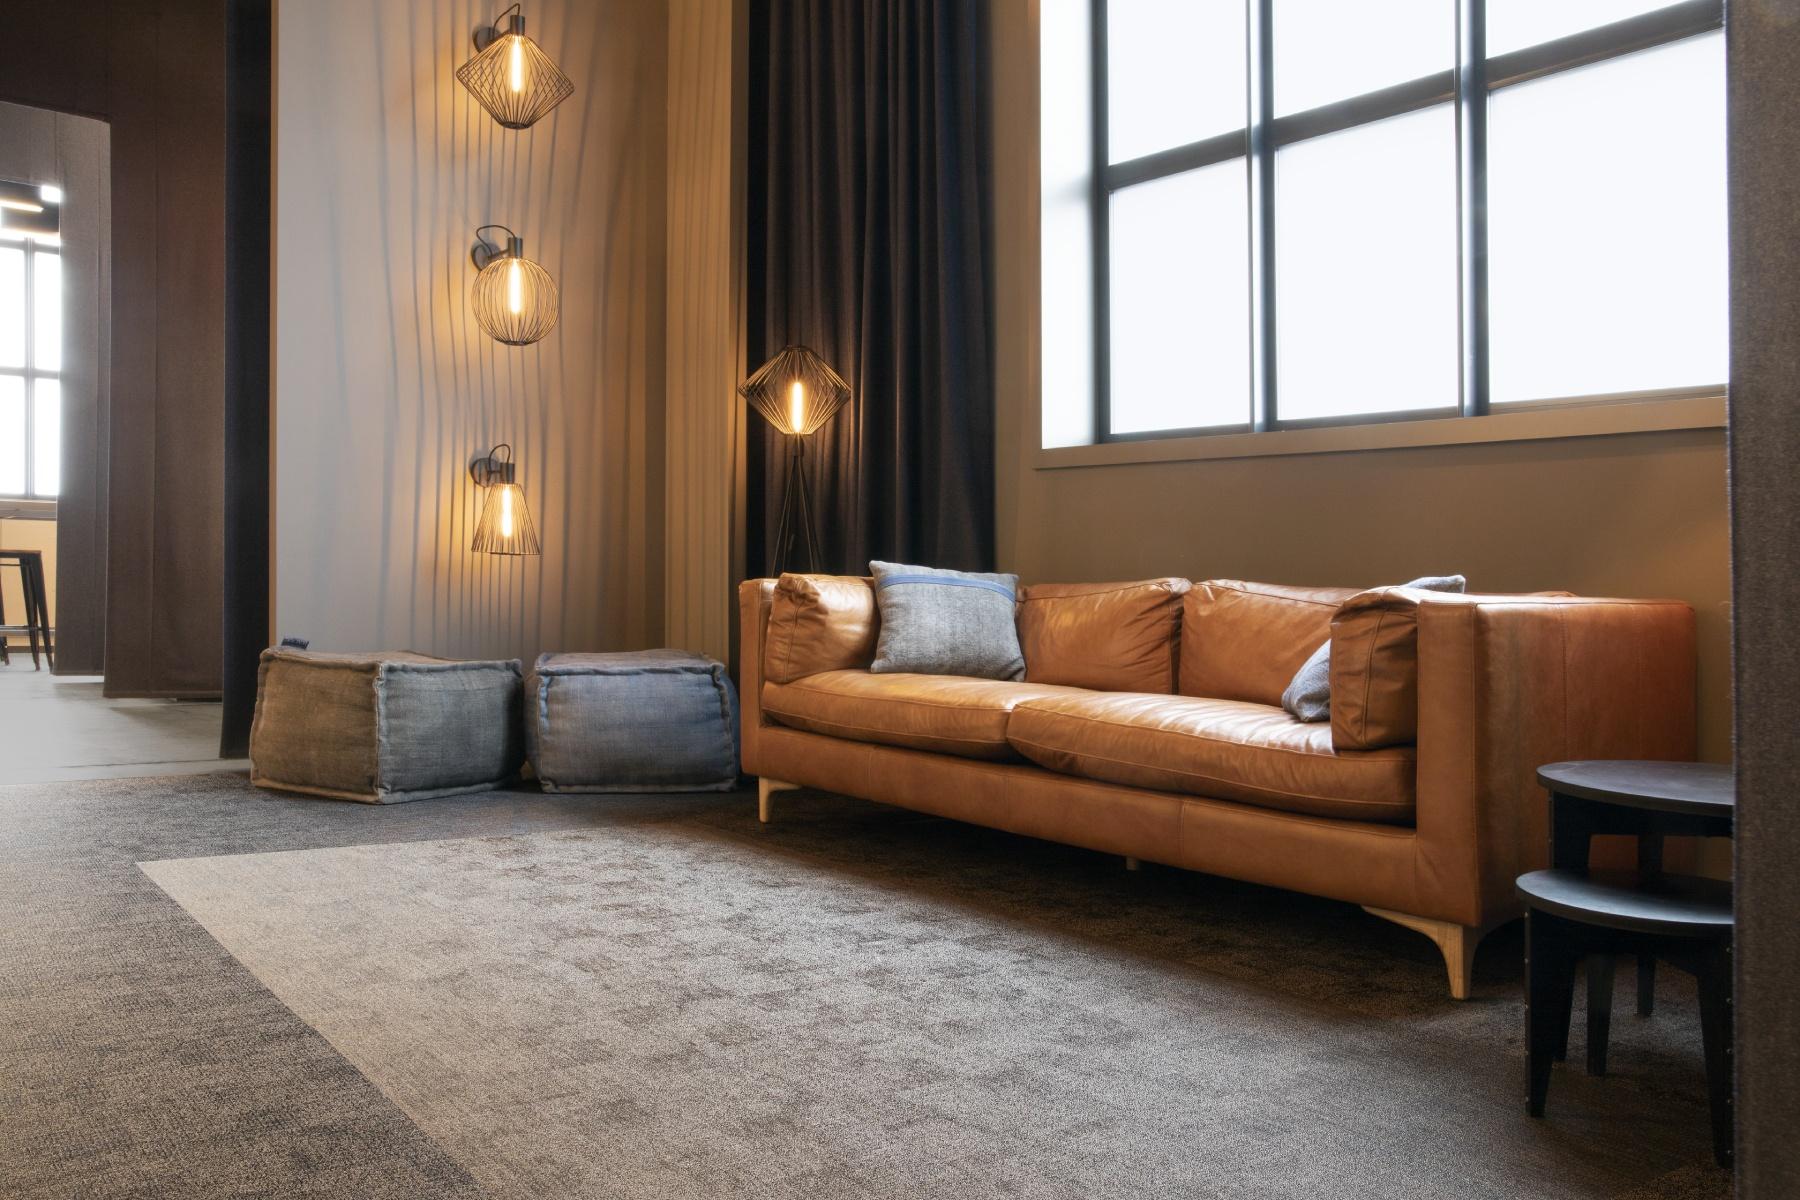 Stardust-Hospitality-2019-BE-Kortrijk-1-HYBRID